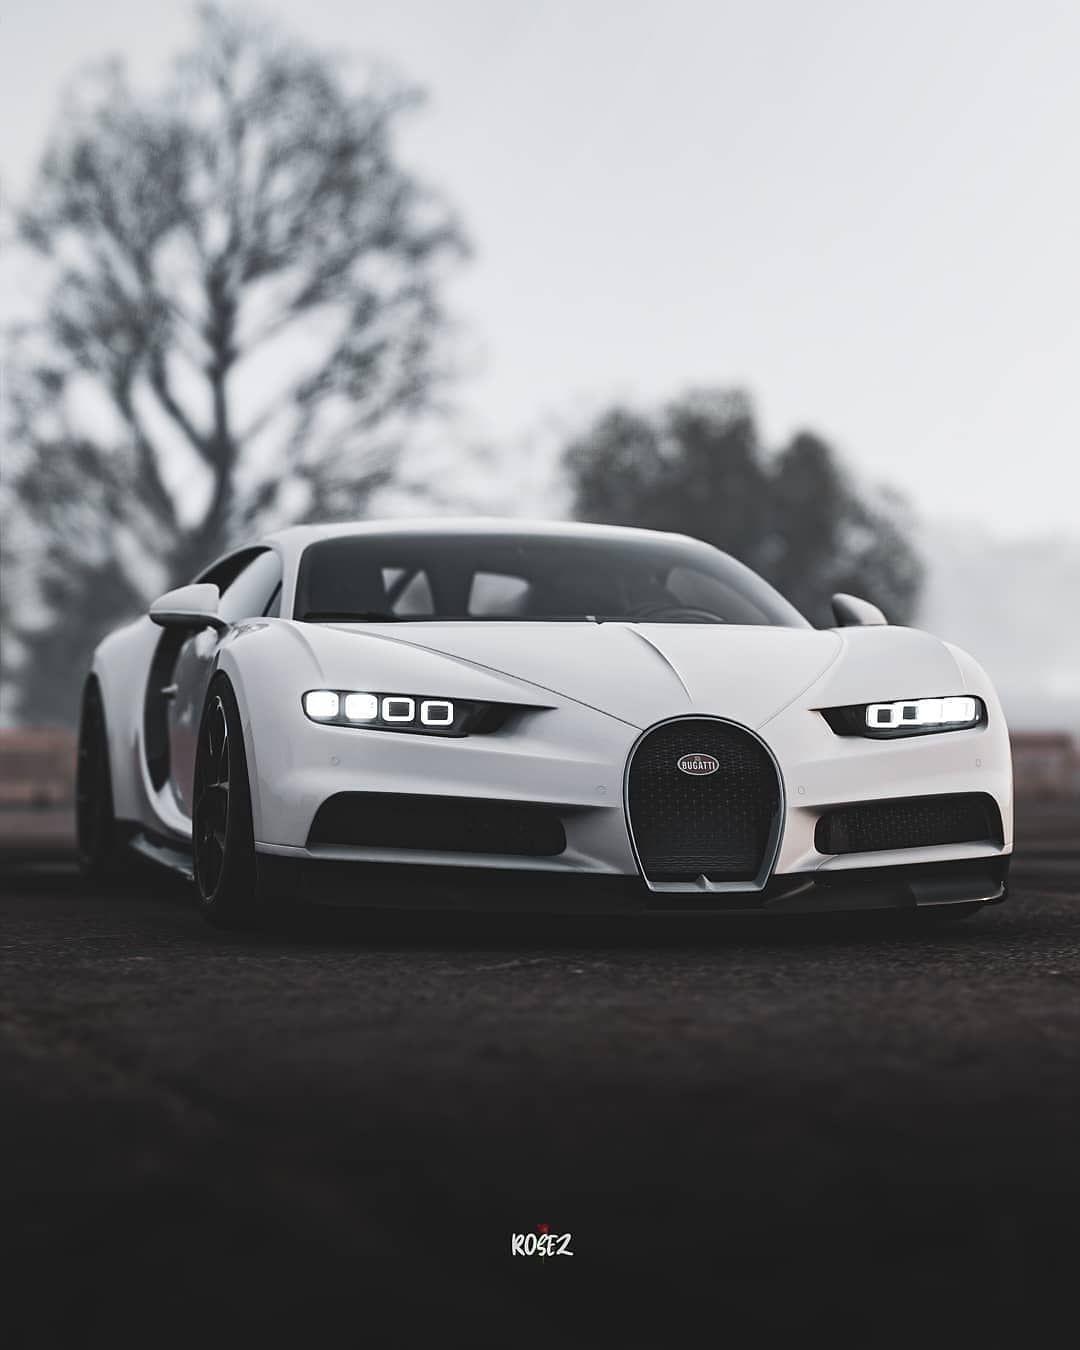 B U G A T T I On Instagram Bugatti Chiron White Rosez Prsx Bugatti Chiron Bugatti Chiron Bugatti Chiron White Best American Cars